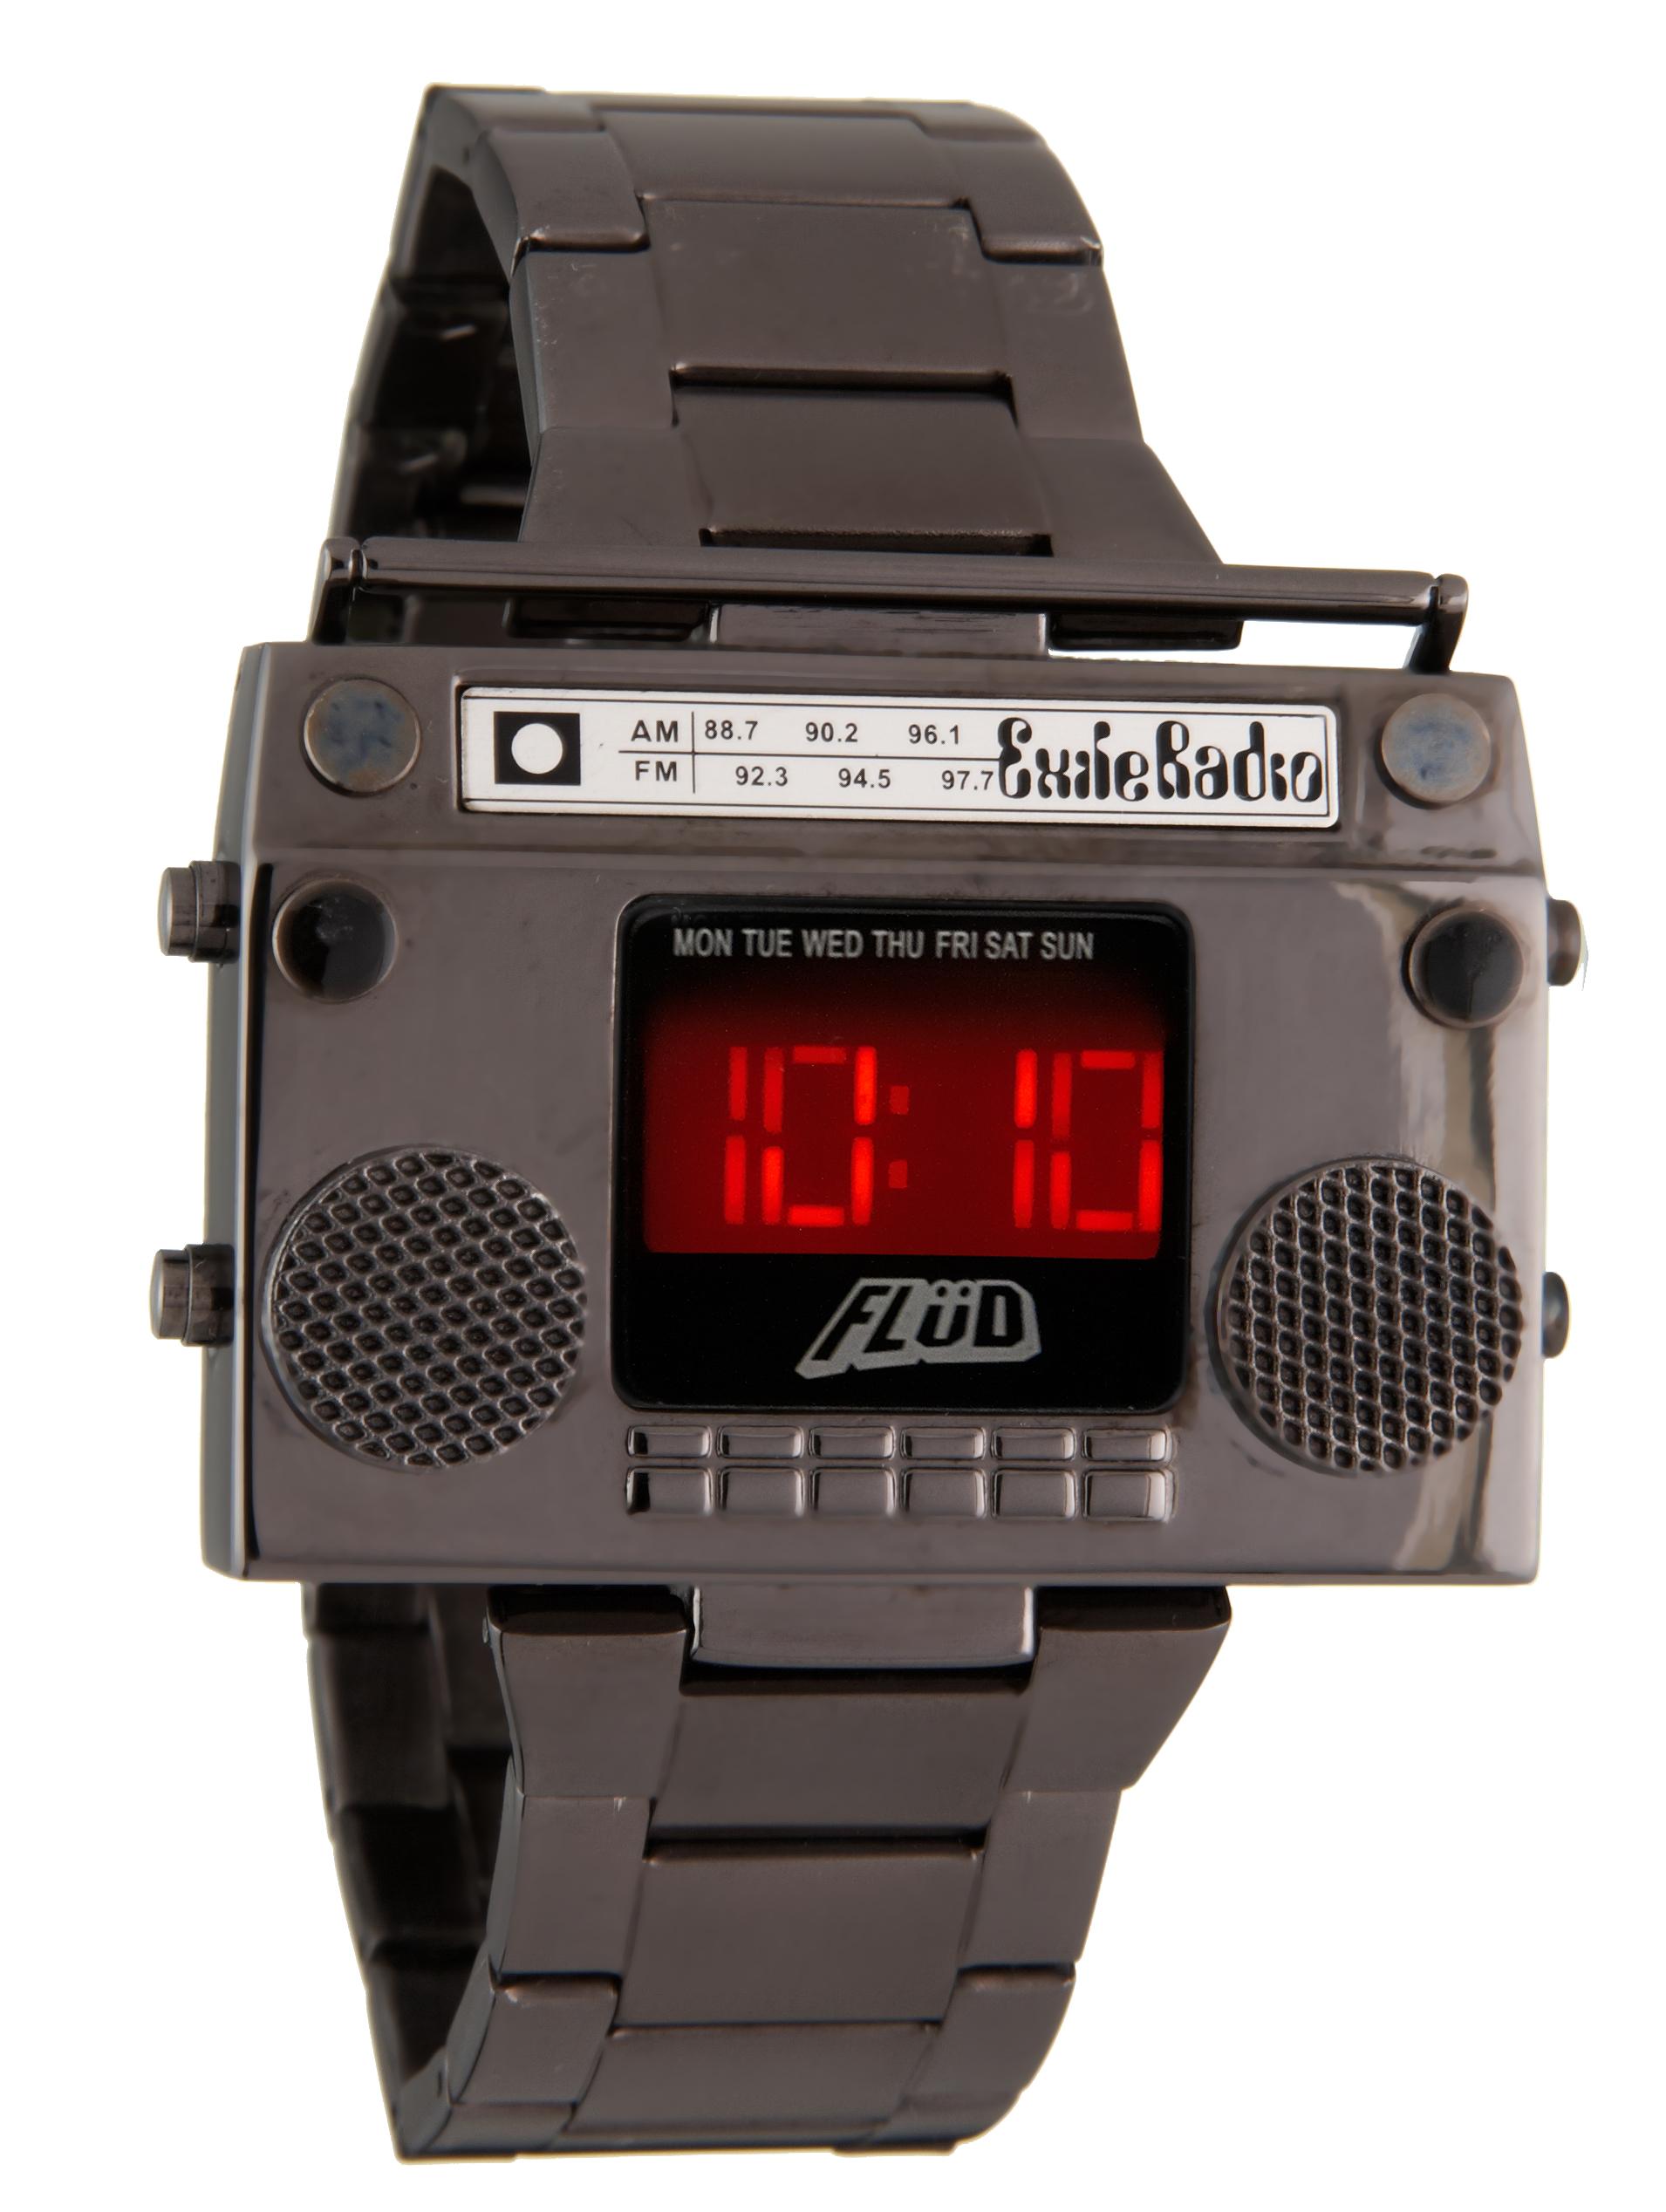 Exile x Flud Watches – Radio Mixtape